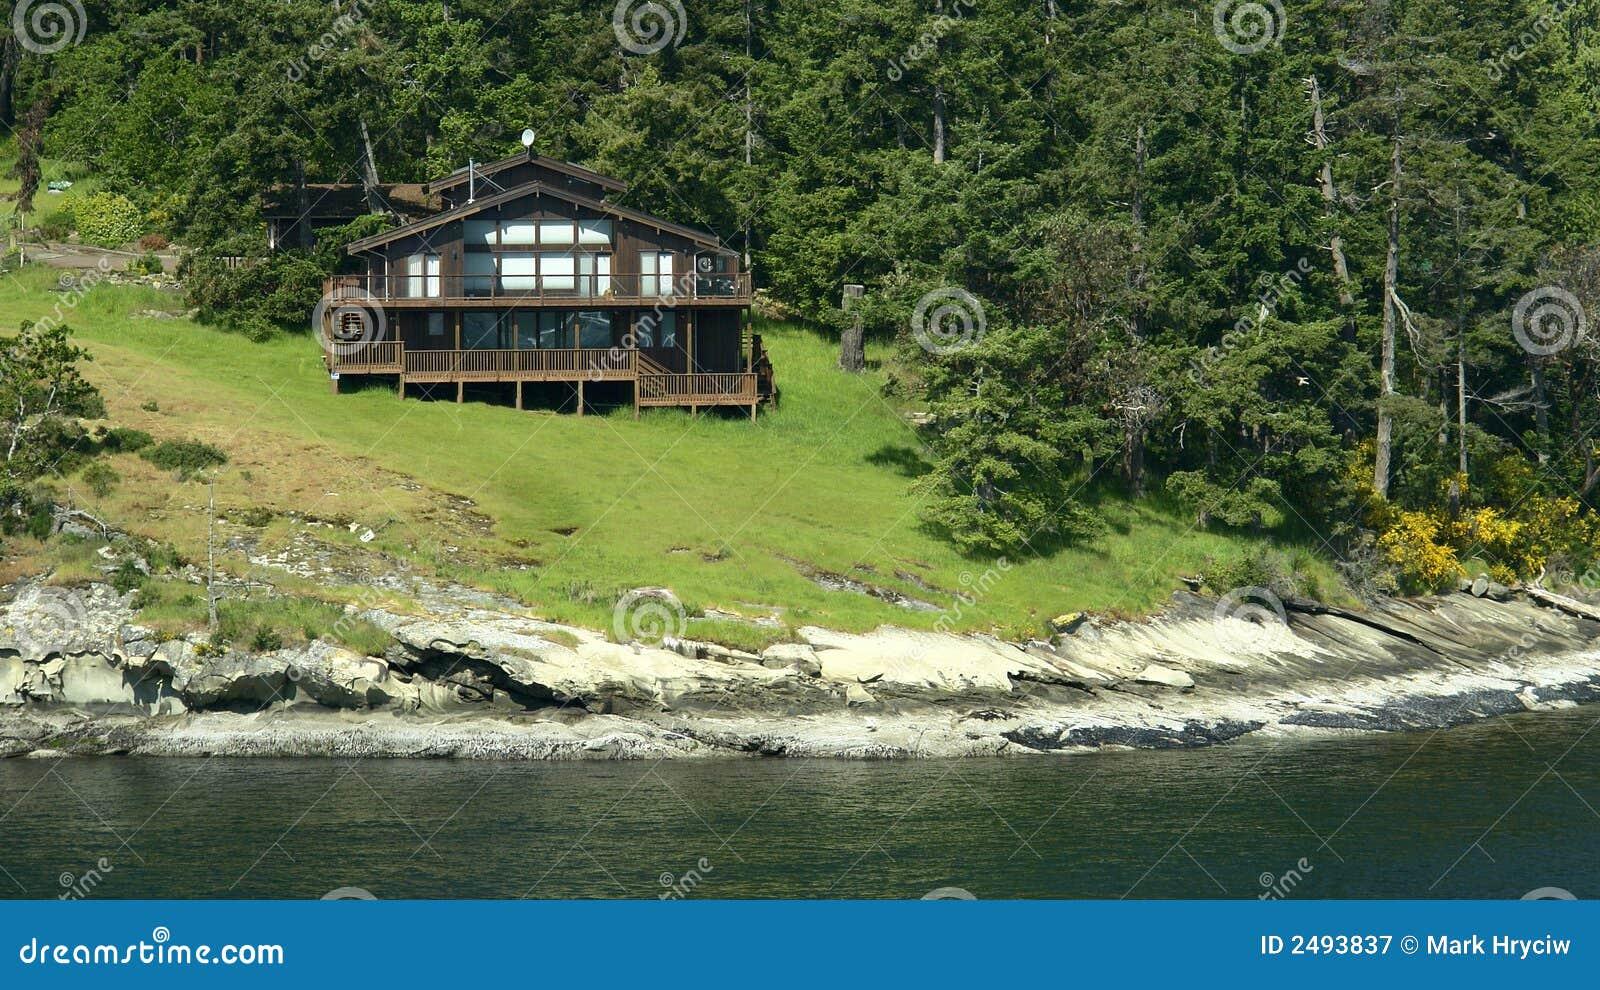 Waterfront Property